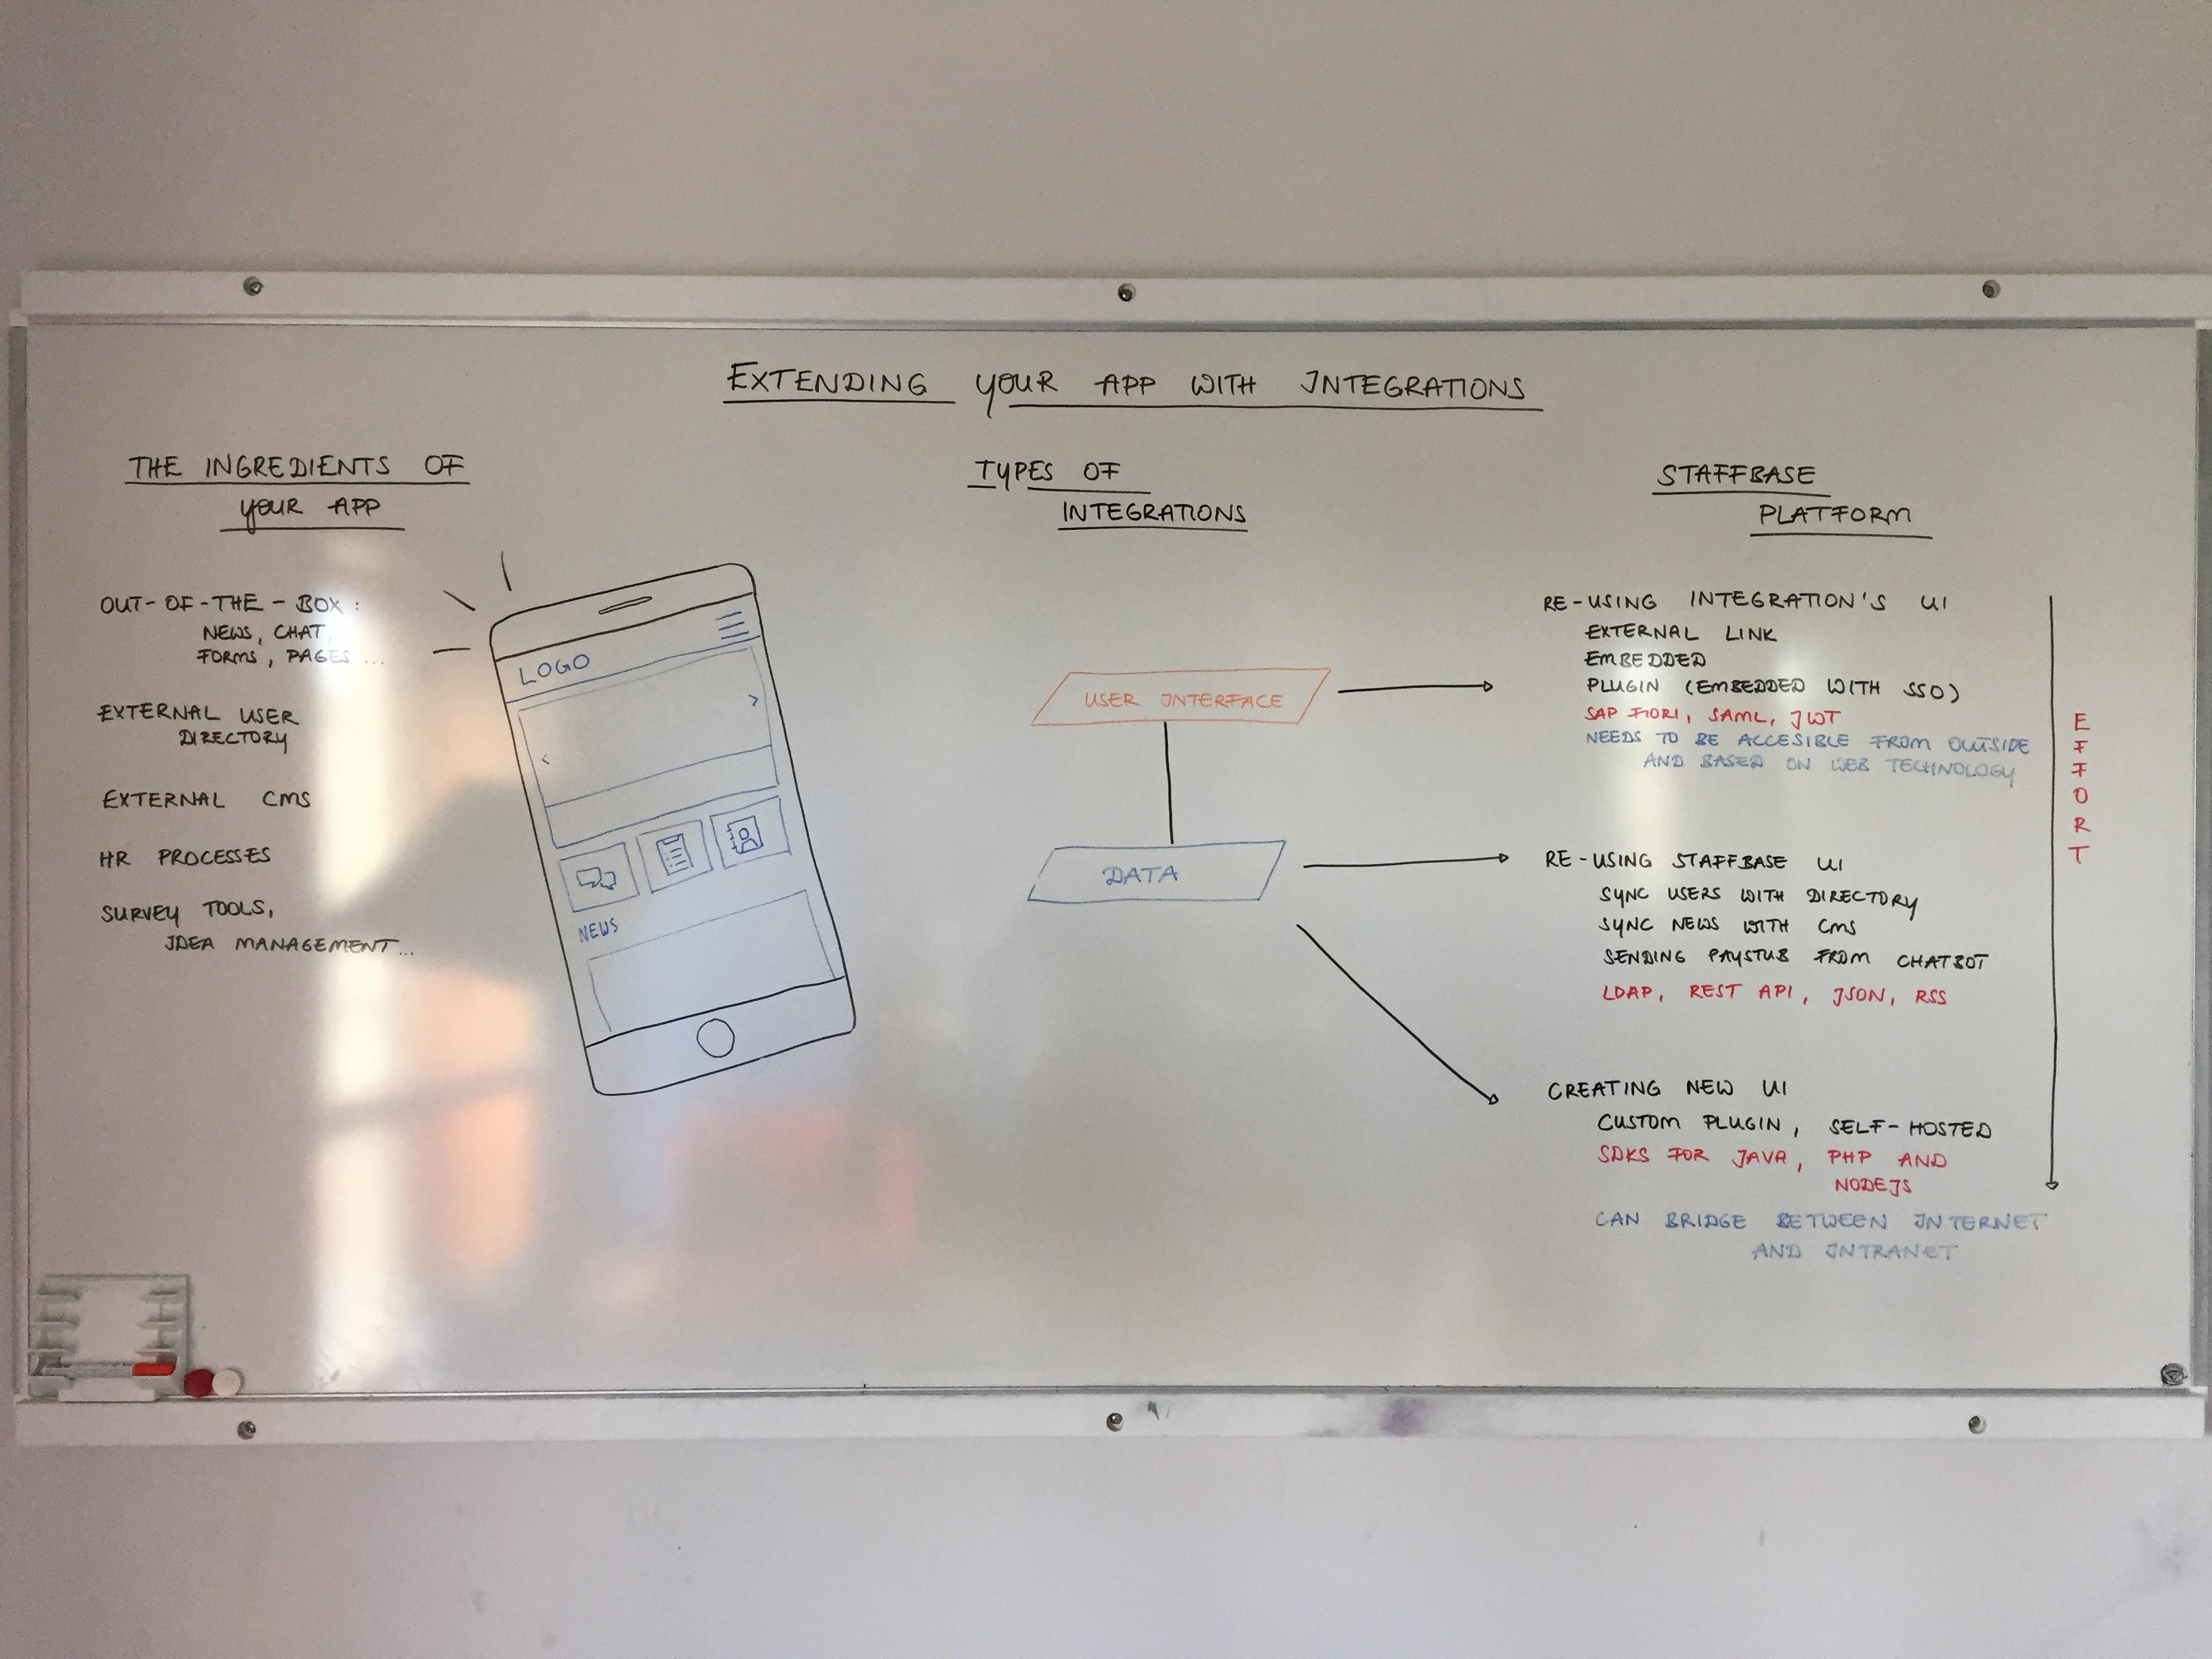 Staffbasics Integrations Whiteboard complete